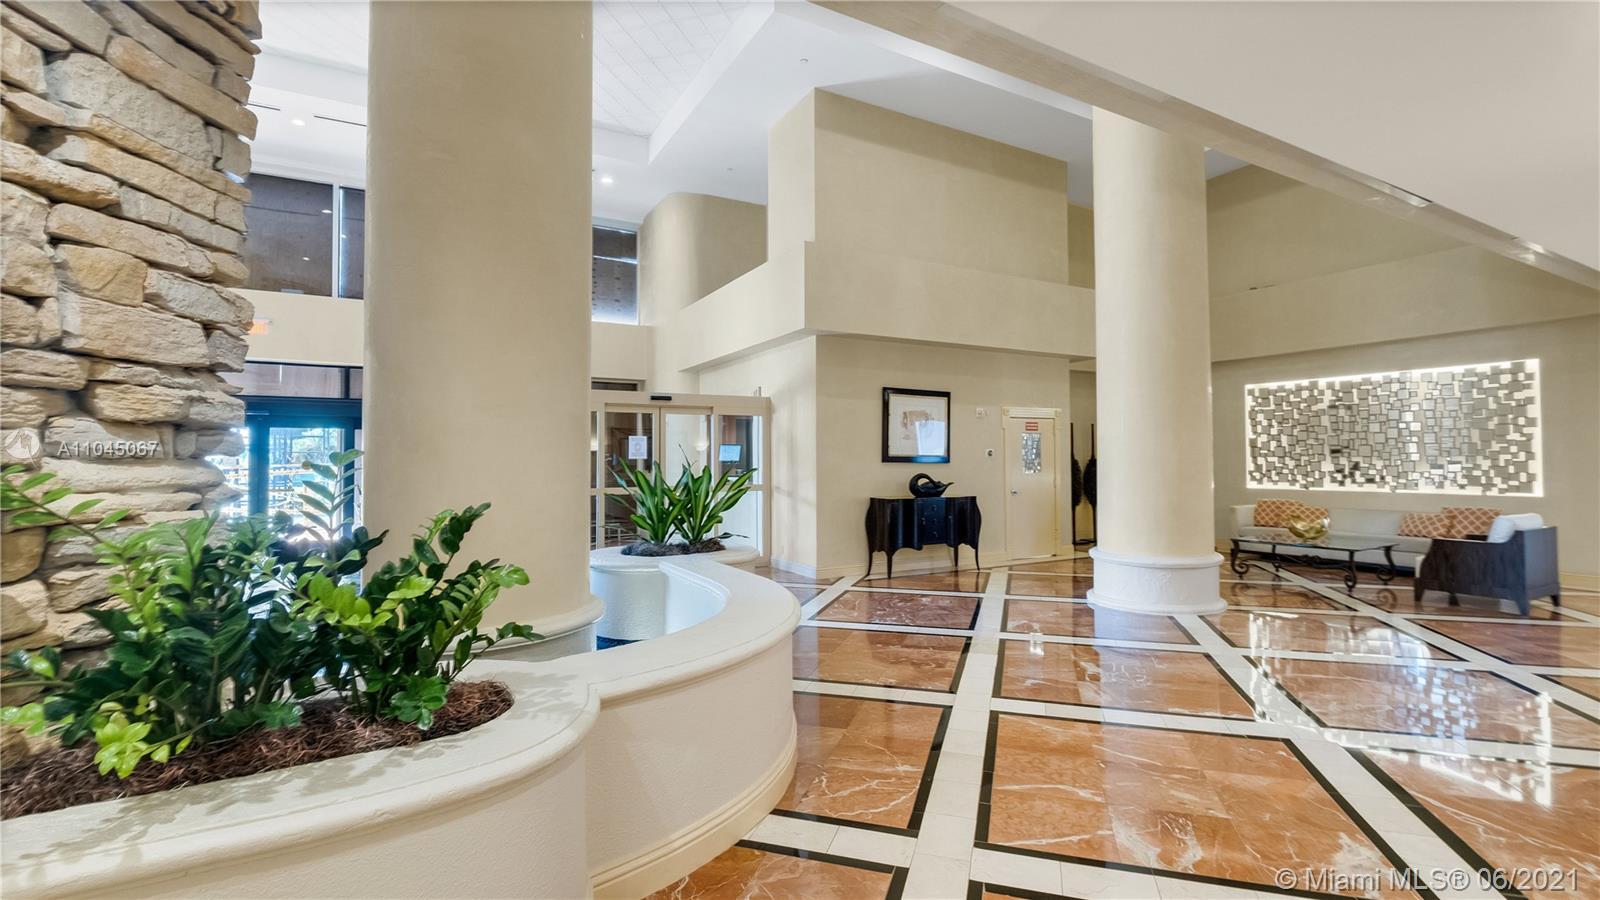 Photo of 20281 Country Club Dr #314, Aventura, Florida, 33180 - Entry to condominium